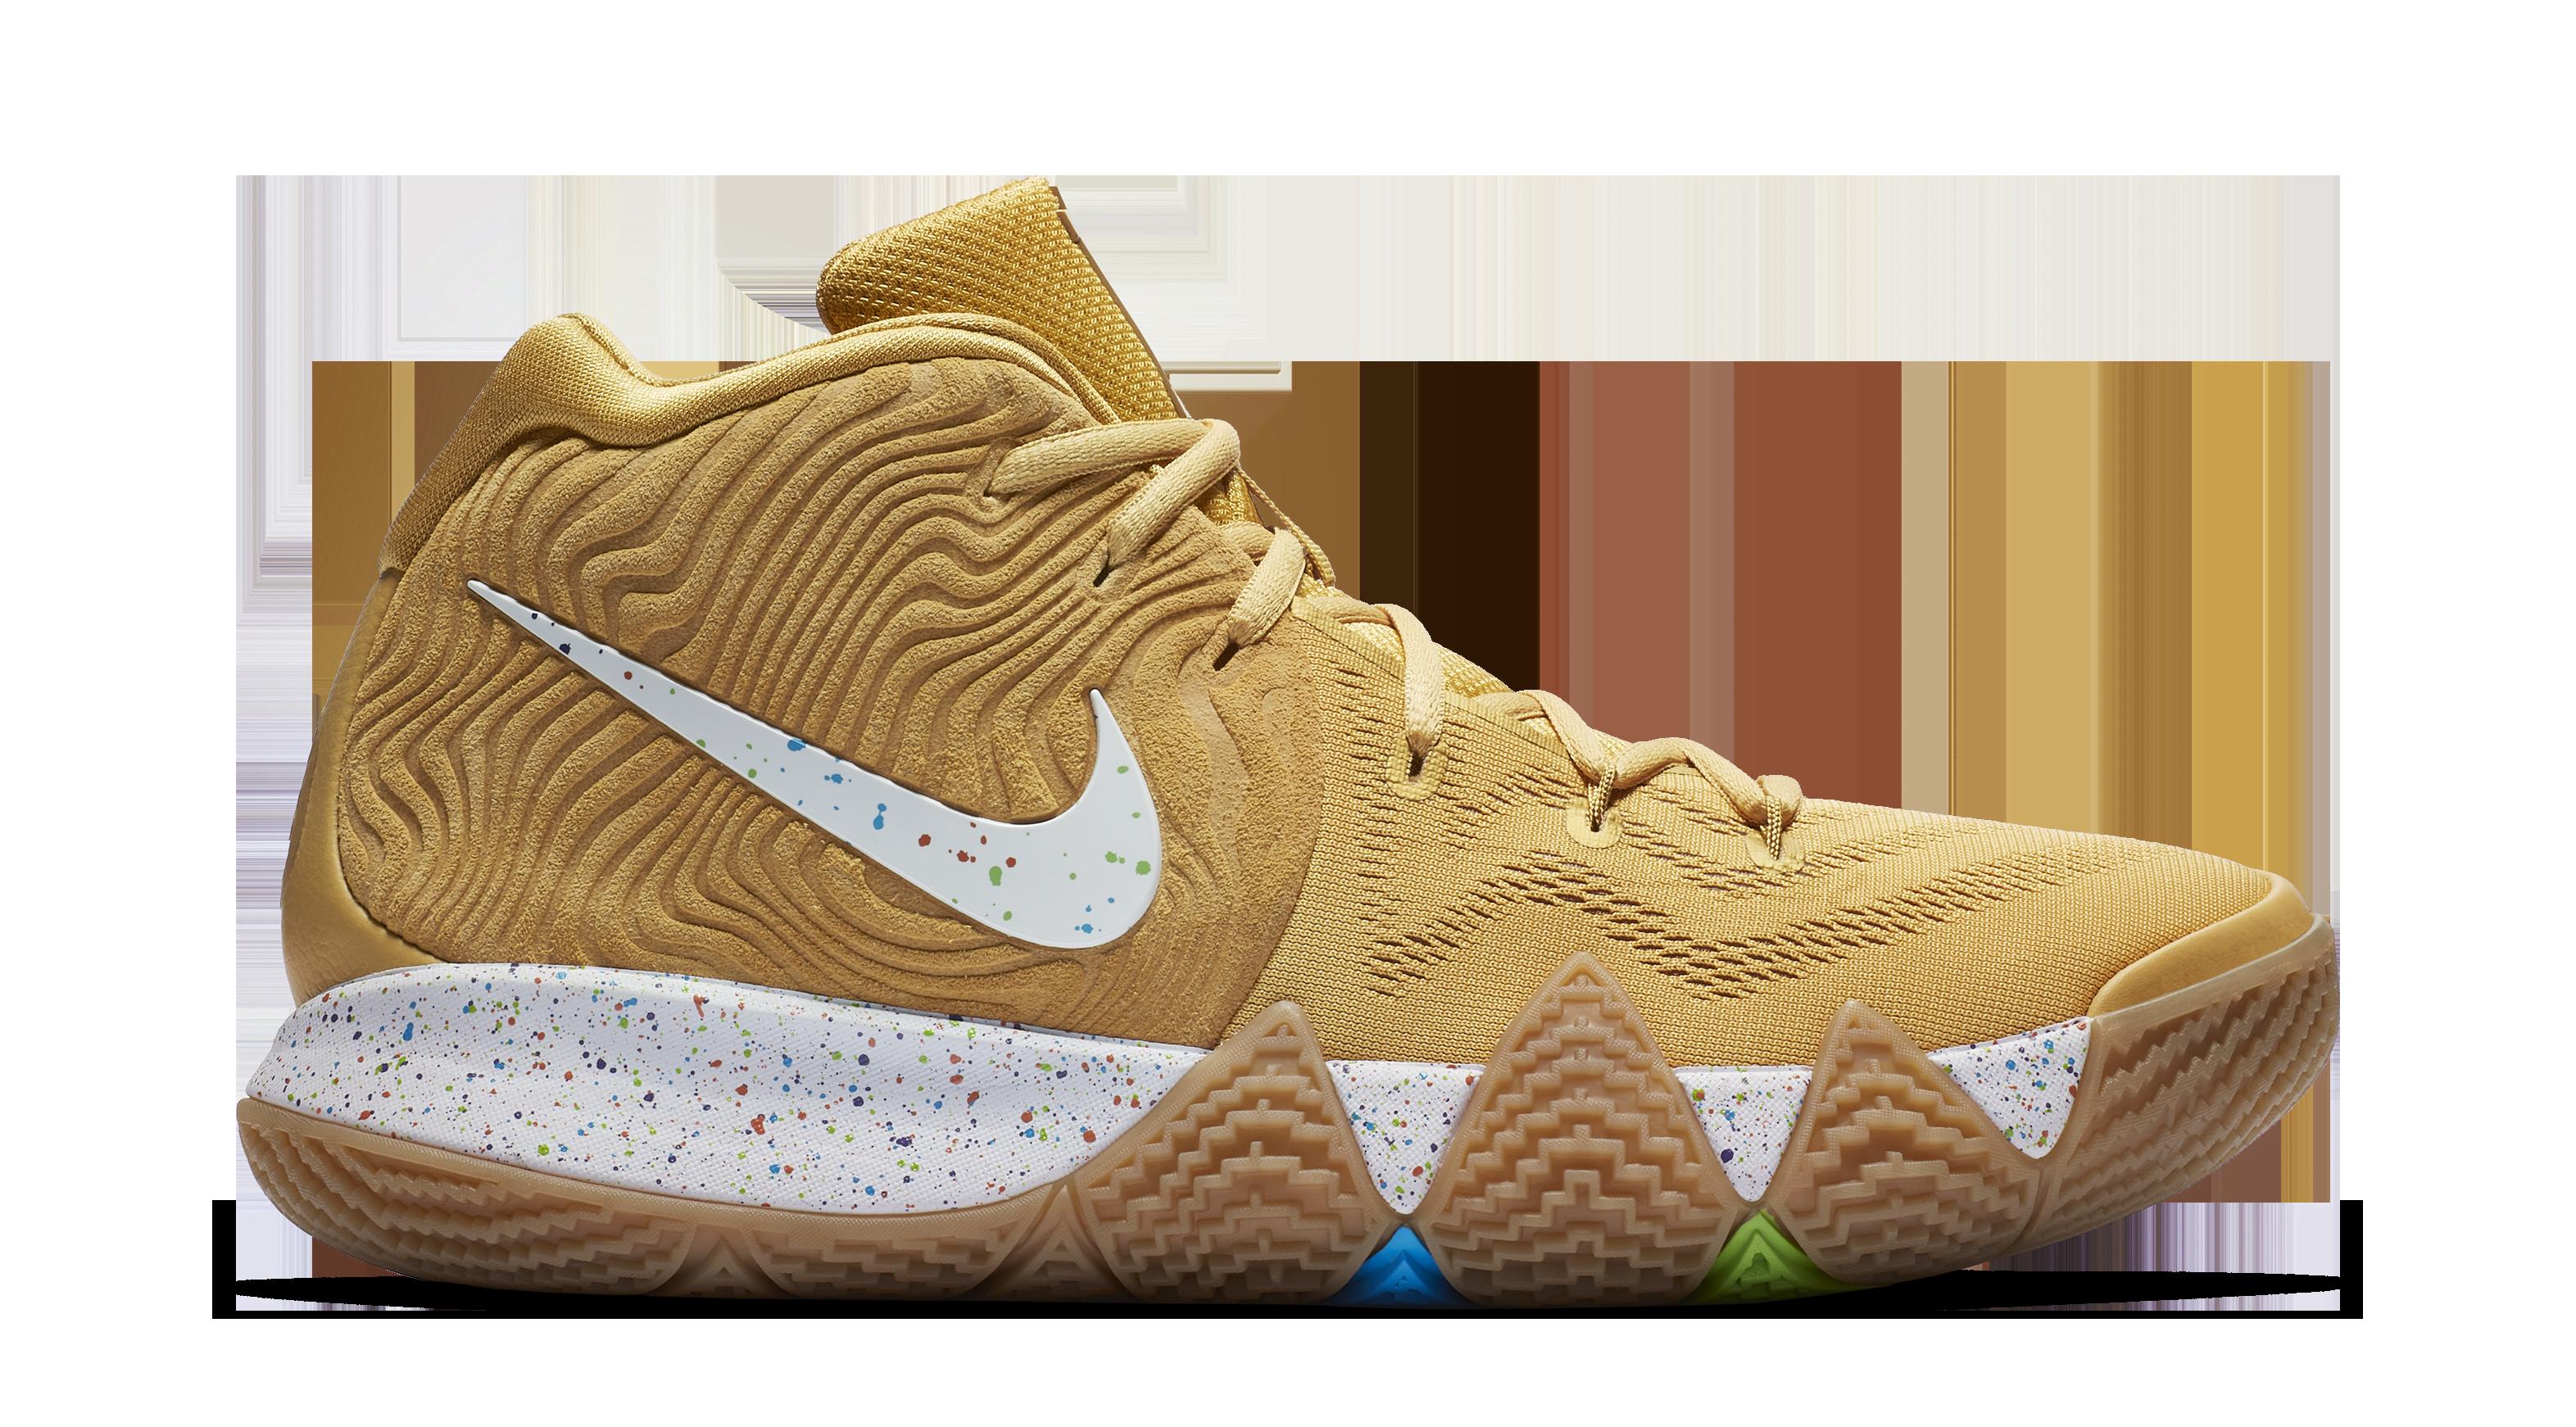 Nike Kyrie 4 'Cinnamon Toast Crunch' BV0426-900 (Medial)